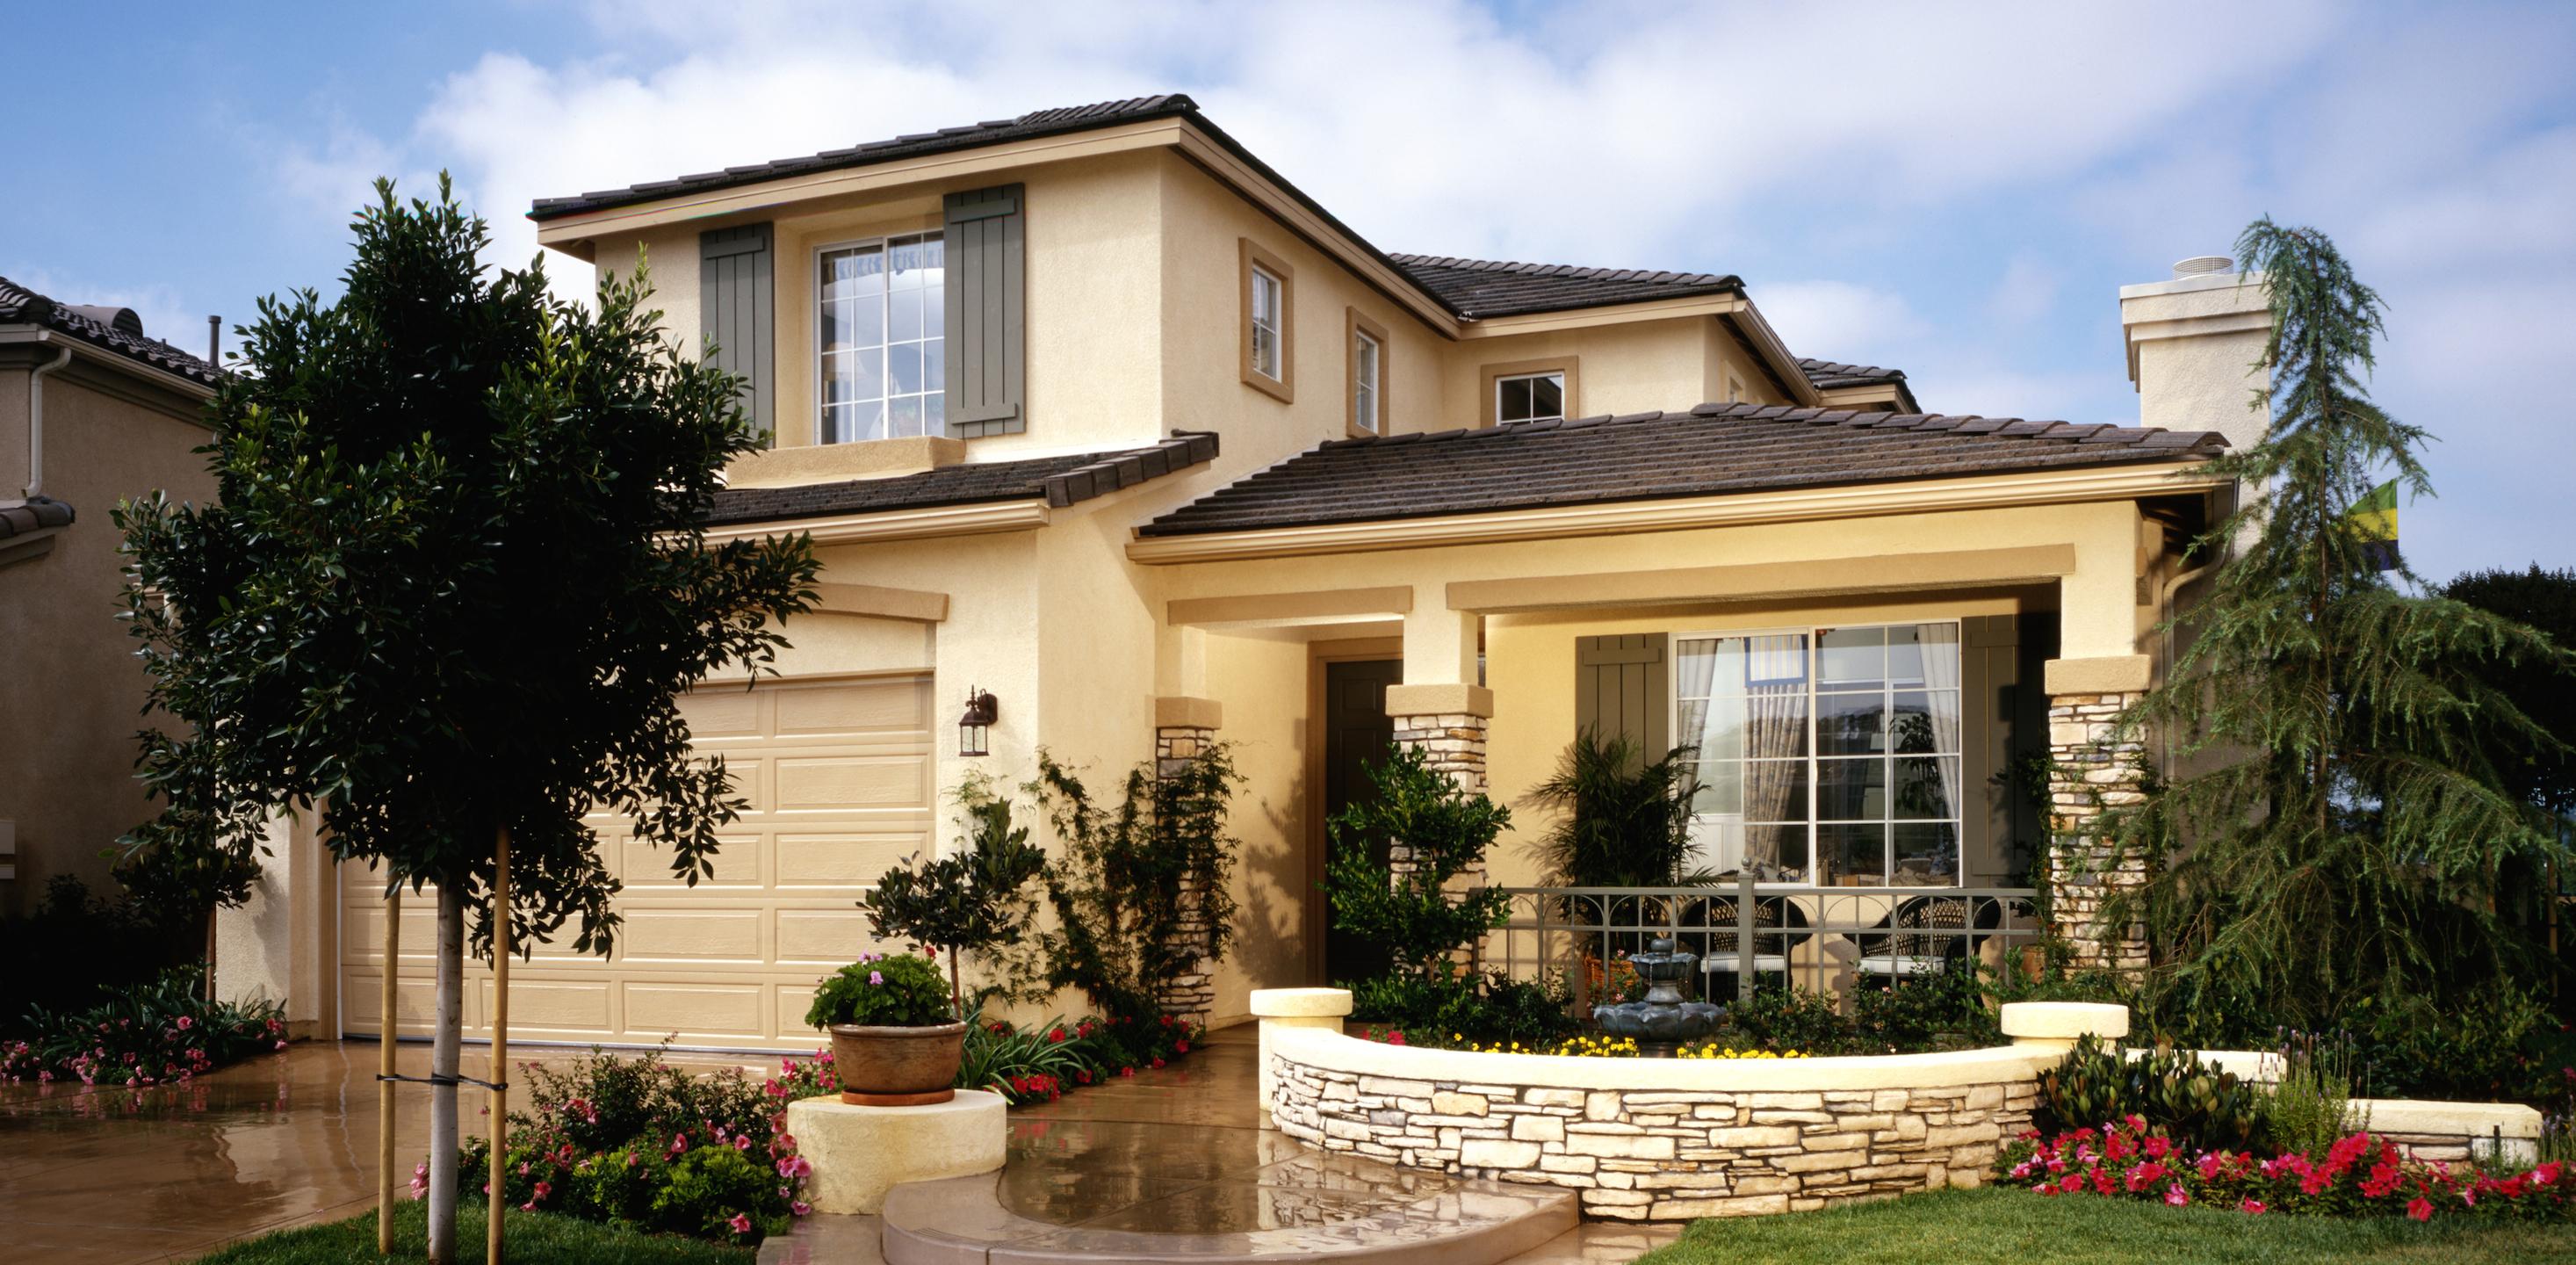 California Park Real Estate | California Park Homes and Condos for Sale